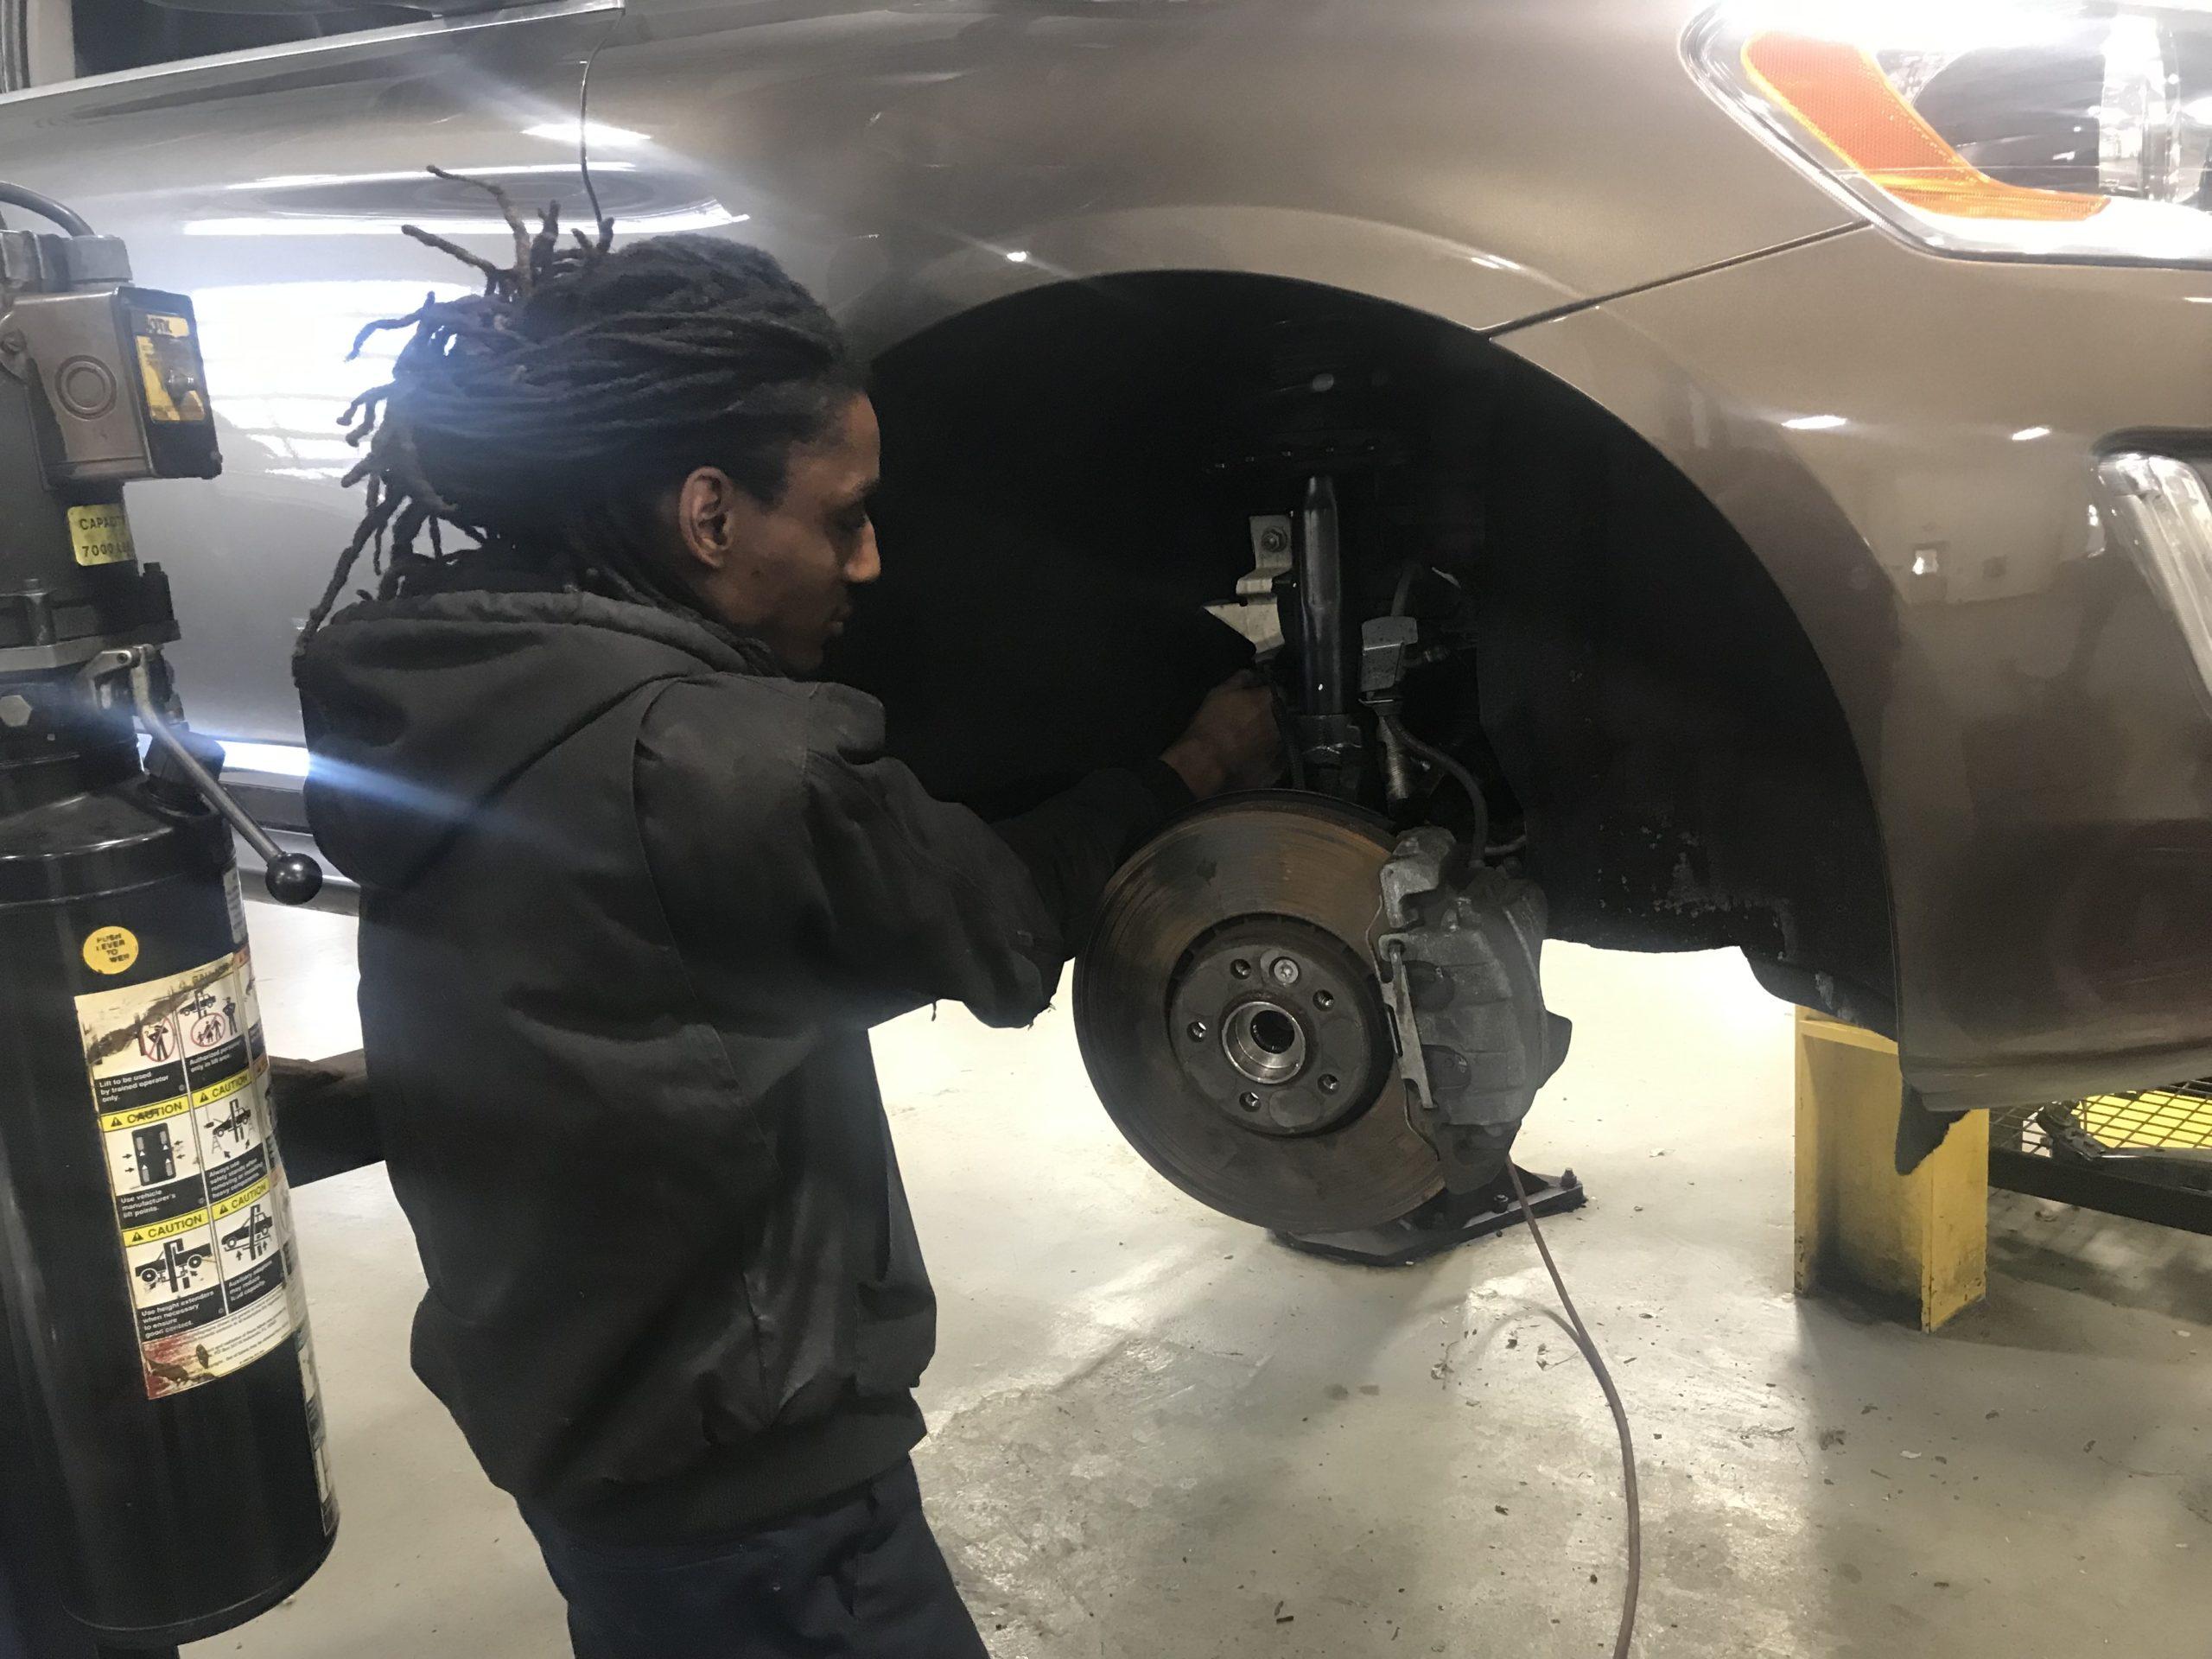 NCCTI Automotive Technician Graduate Furthers Career At Volvo Dealership